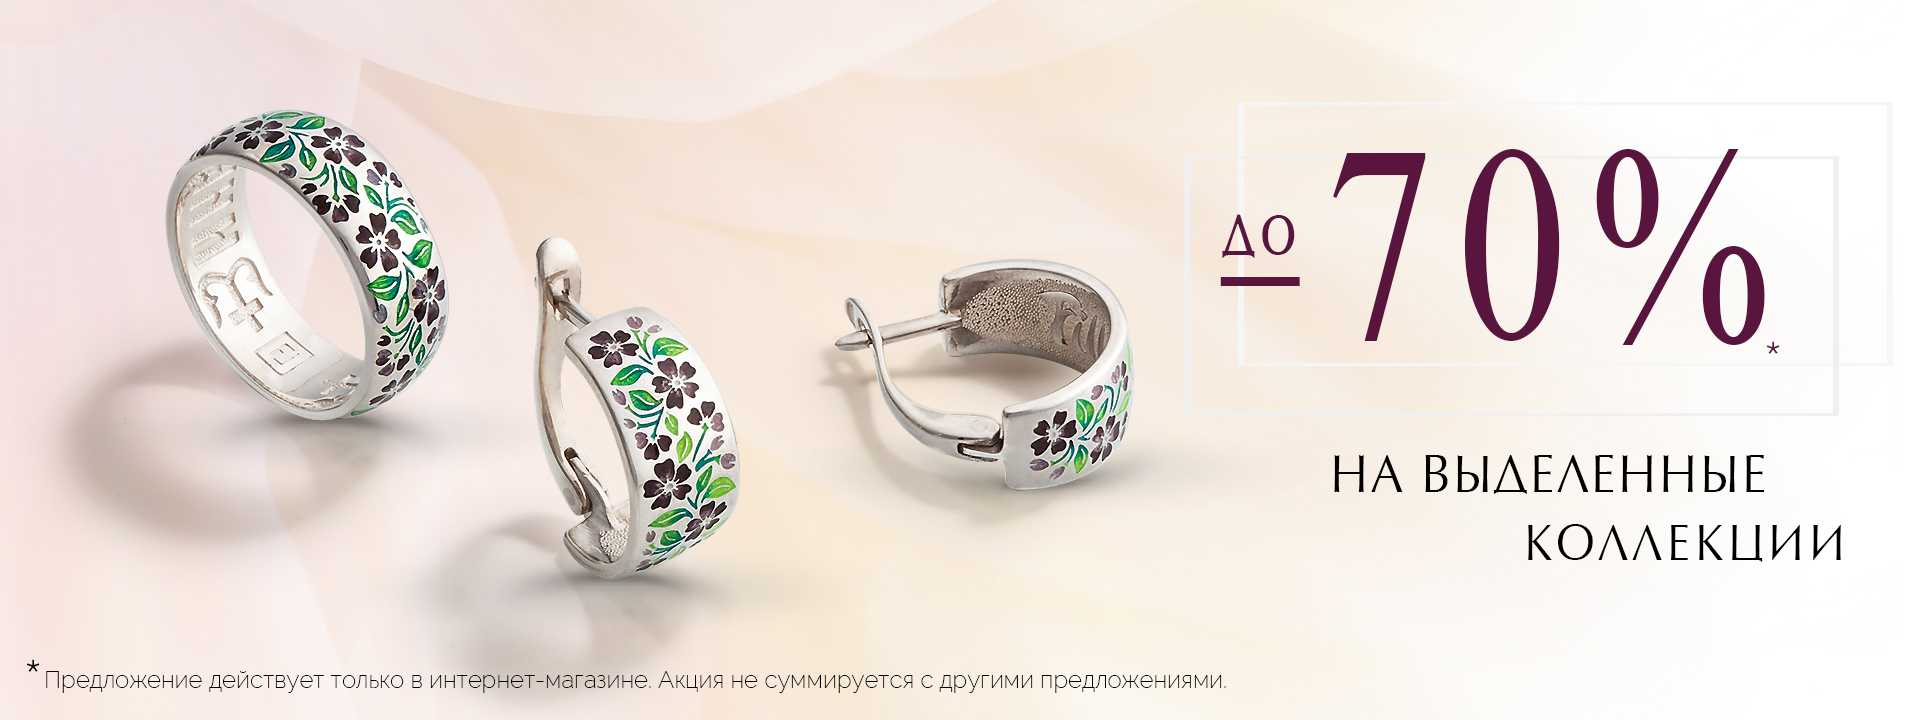 aktsiya dlya sajta 70 - Главная